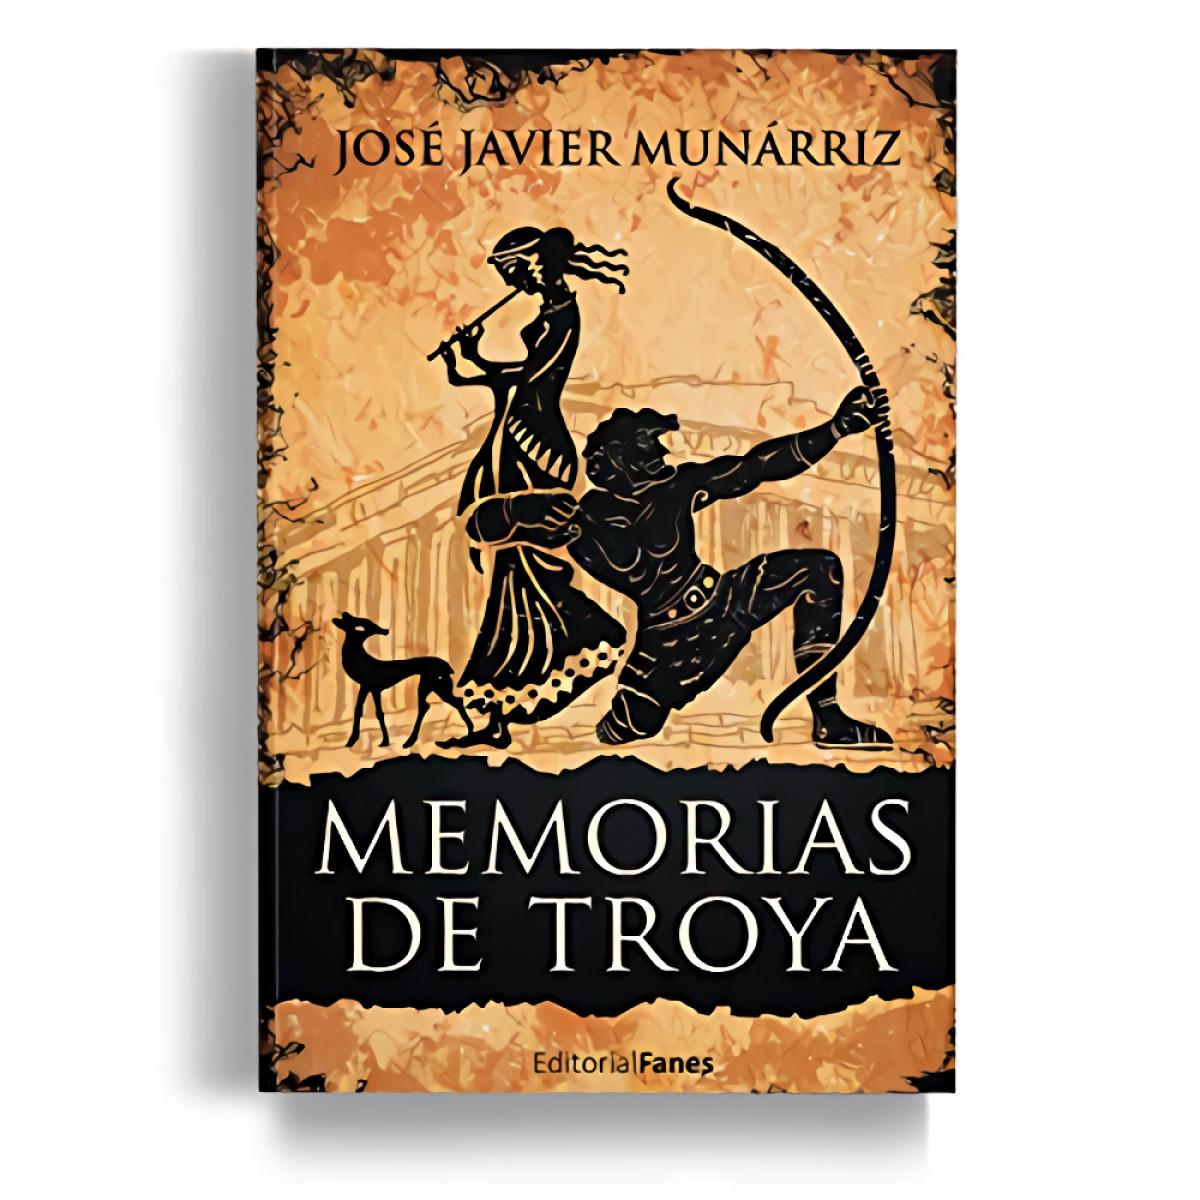 MEMORIAS DE TROYA